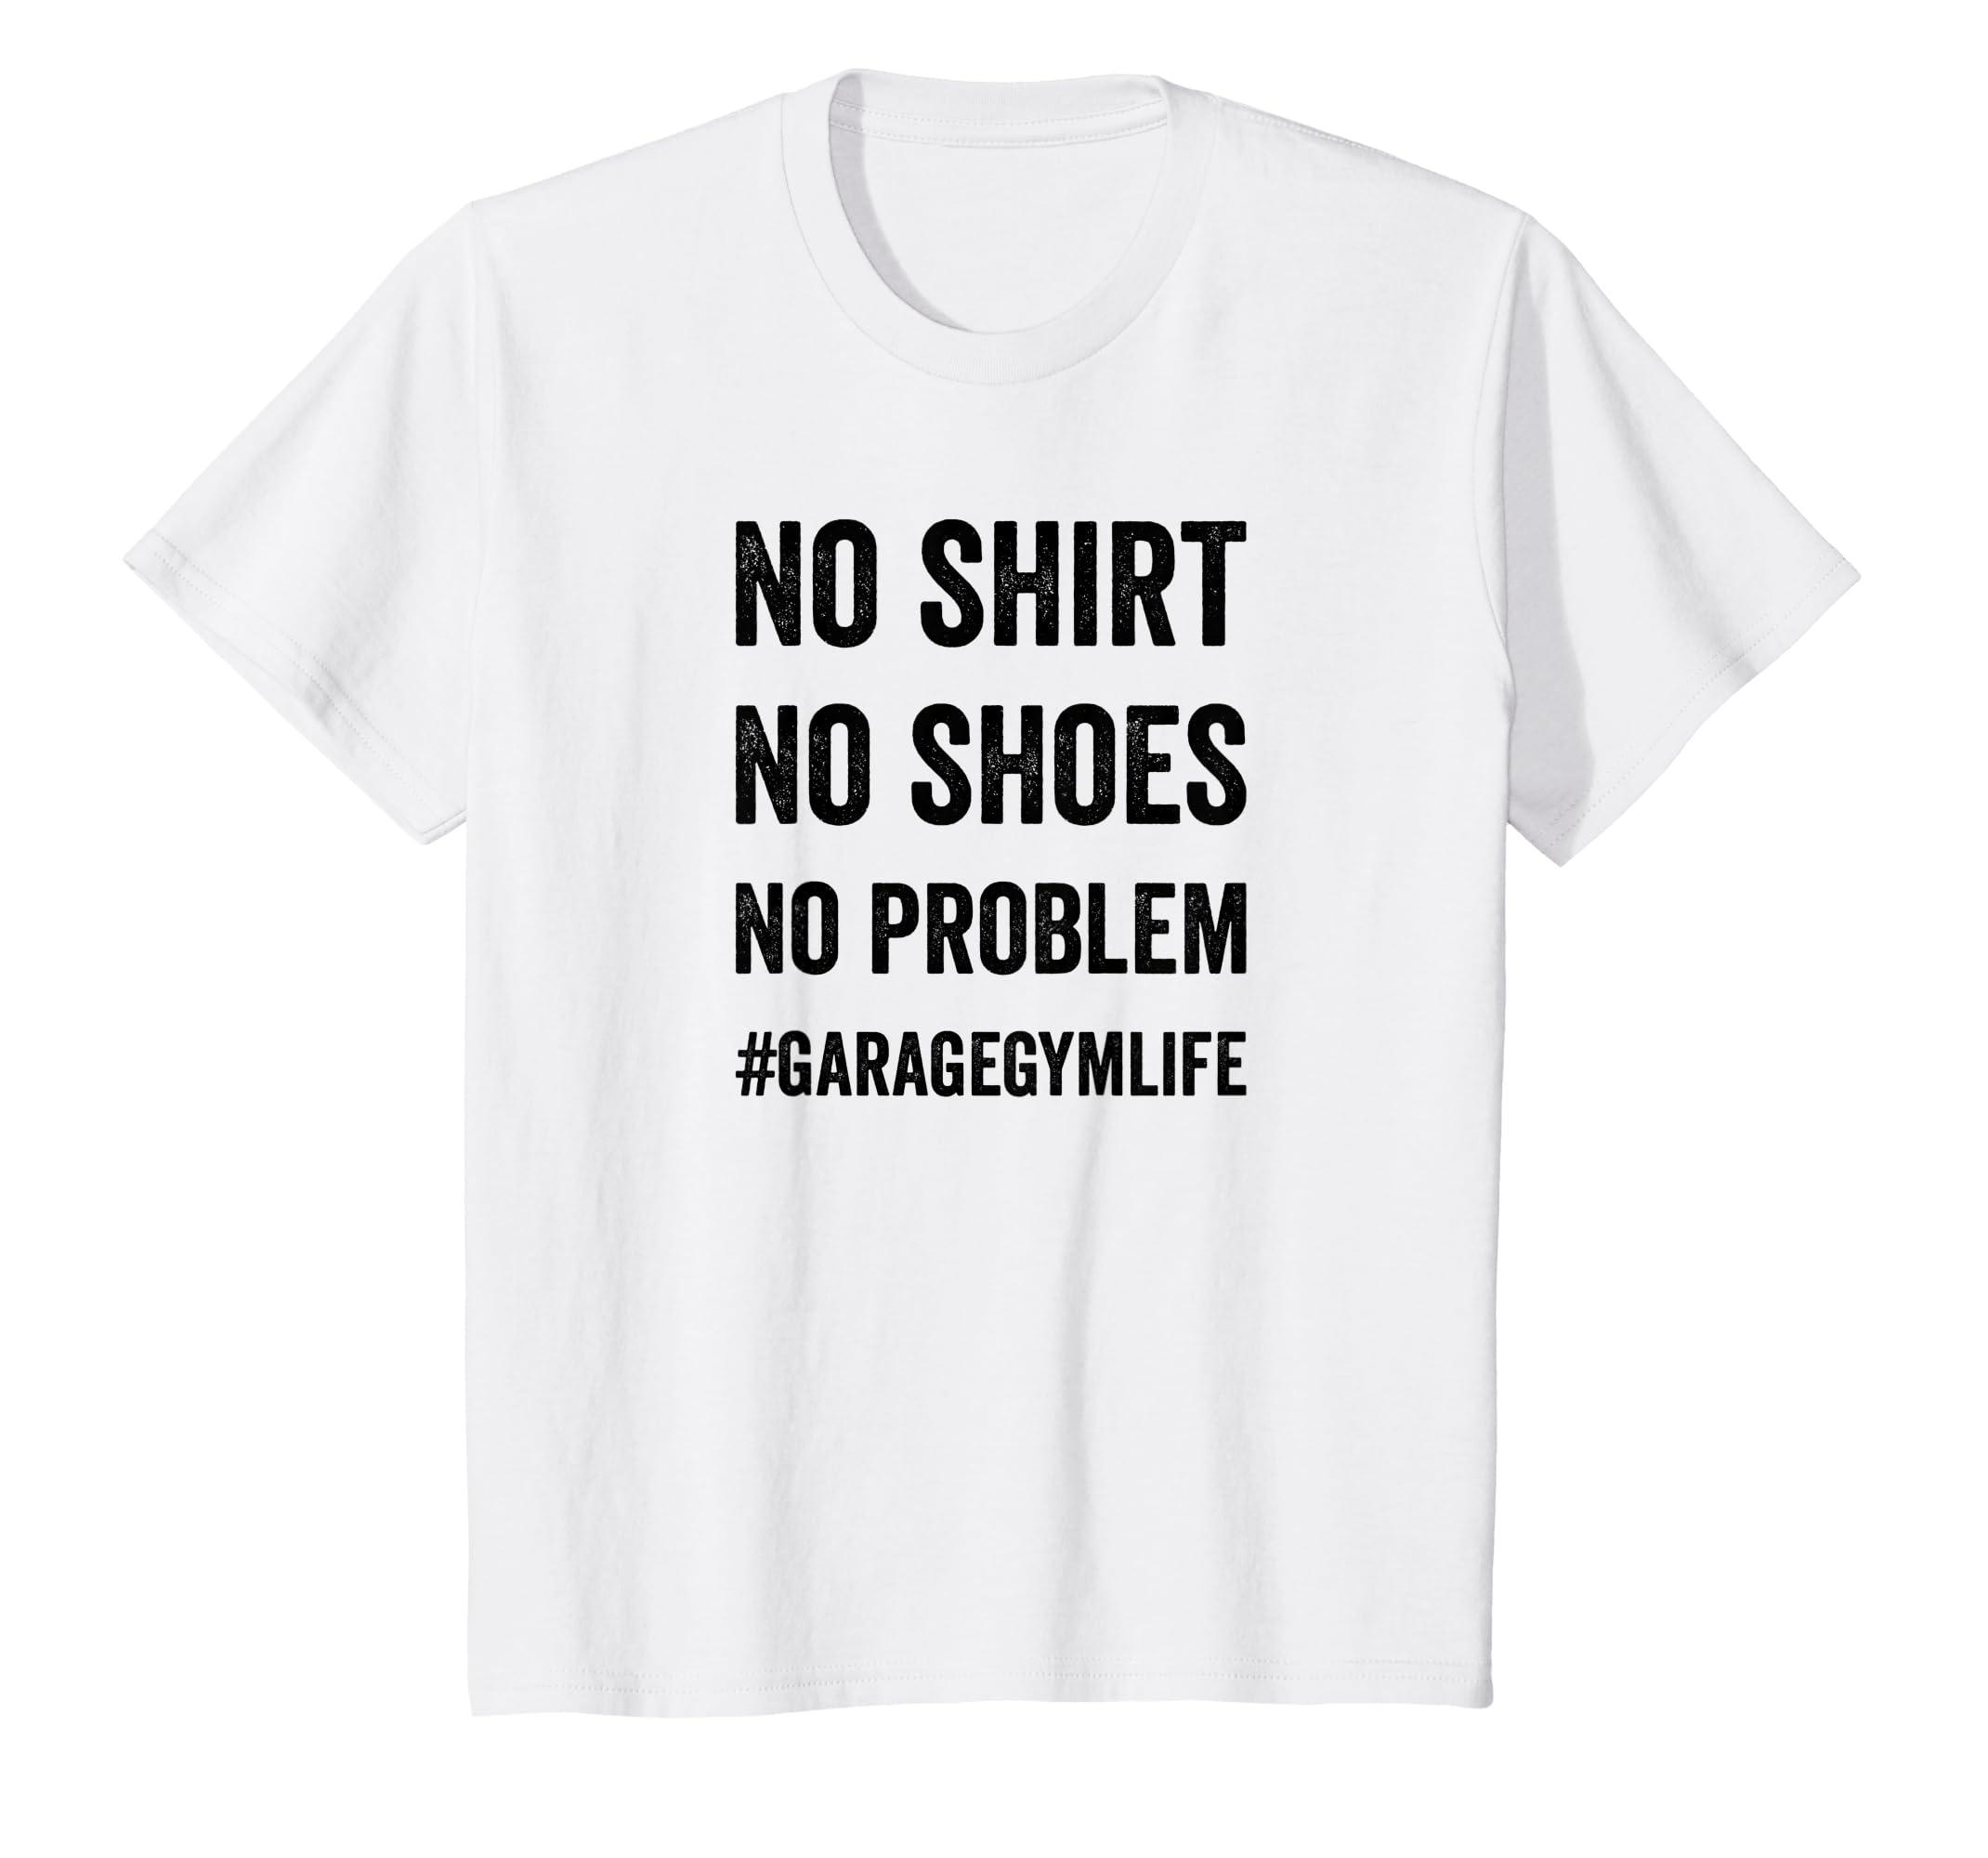 Amazon.com: garage gym life hashtag t shirt for home gym workout